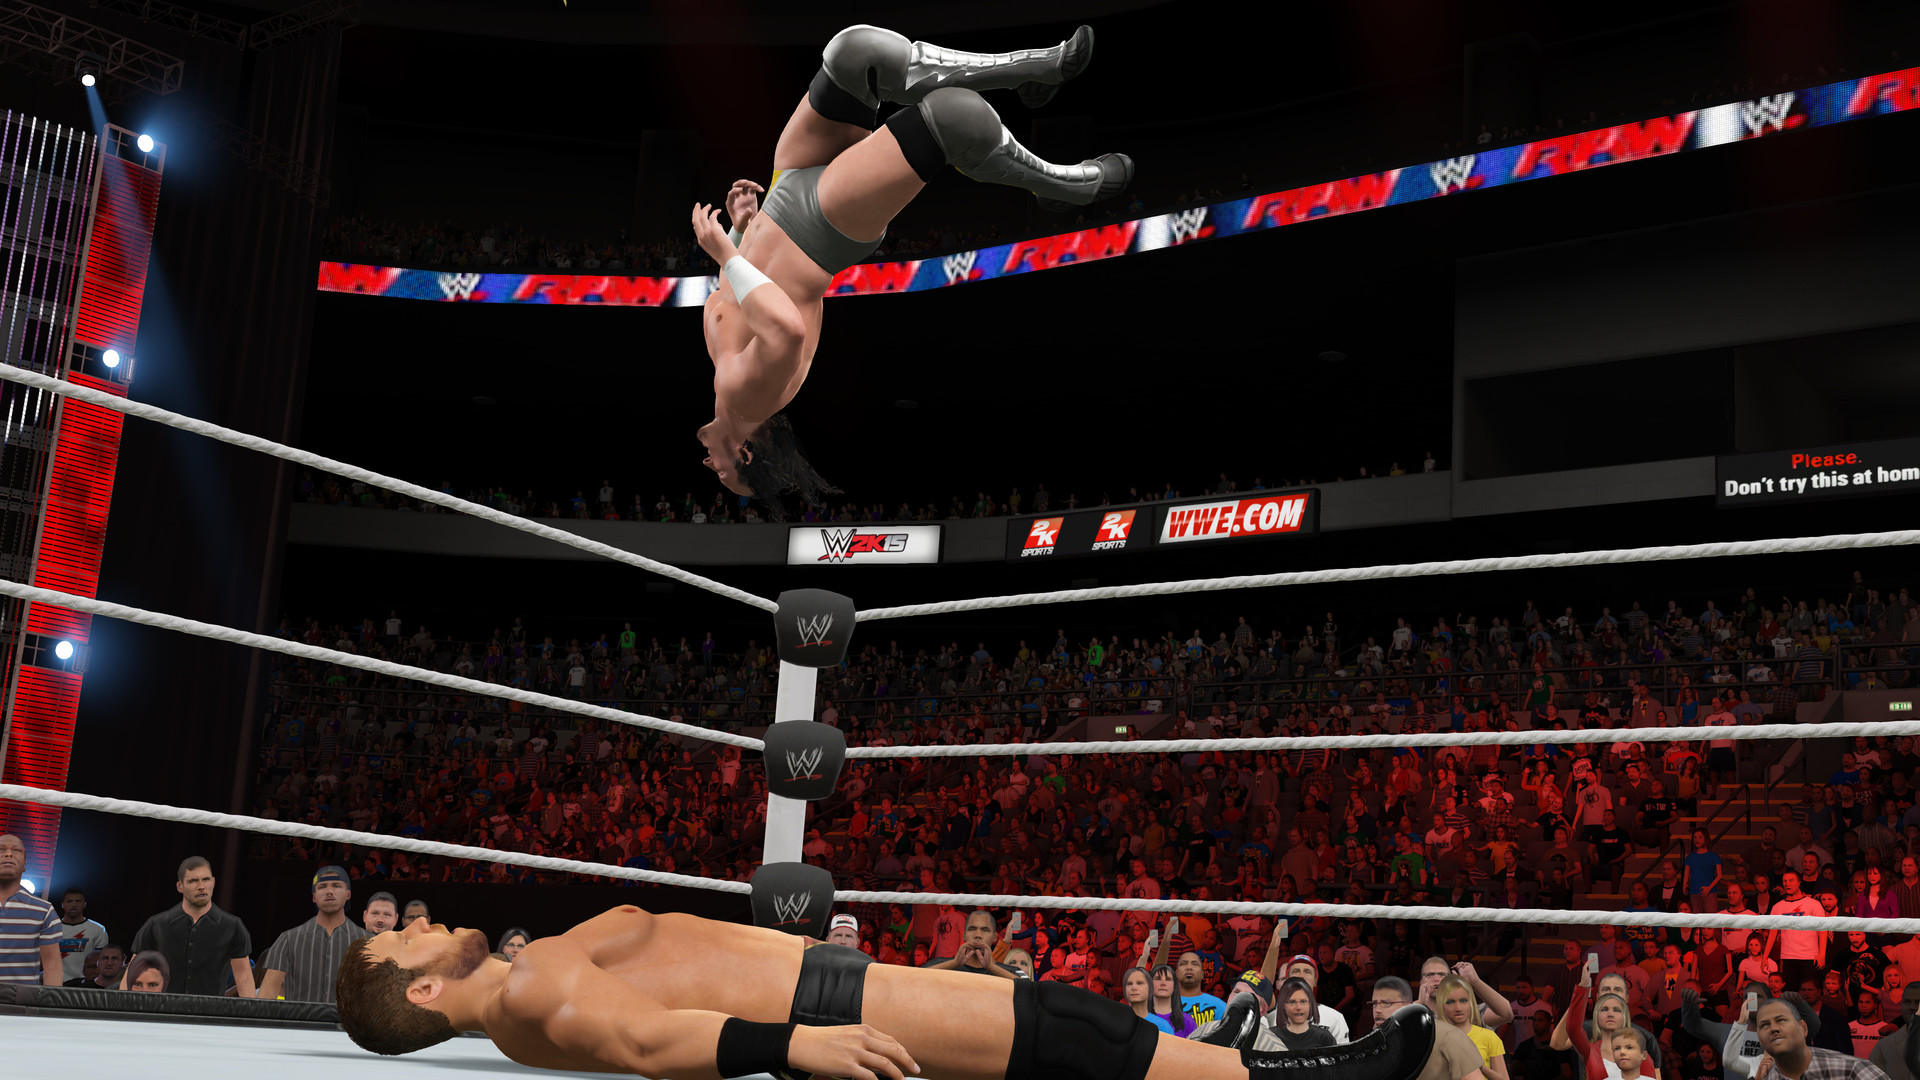 WWE 2K15 ESPAÑOL Full PC + DLC Pack Addon (RELOADED) + REPACK 5 DVD5 (JPW) 6